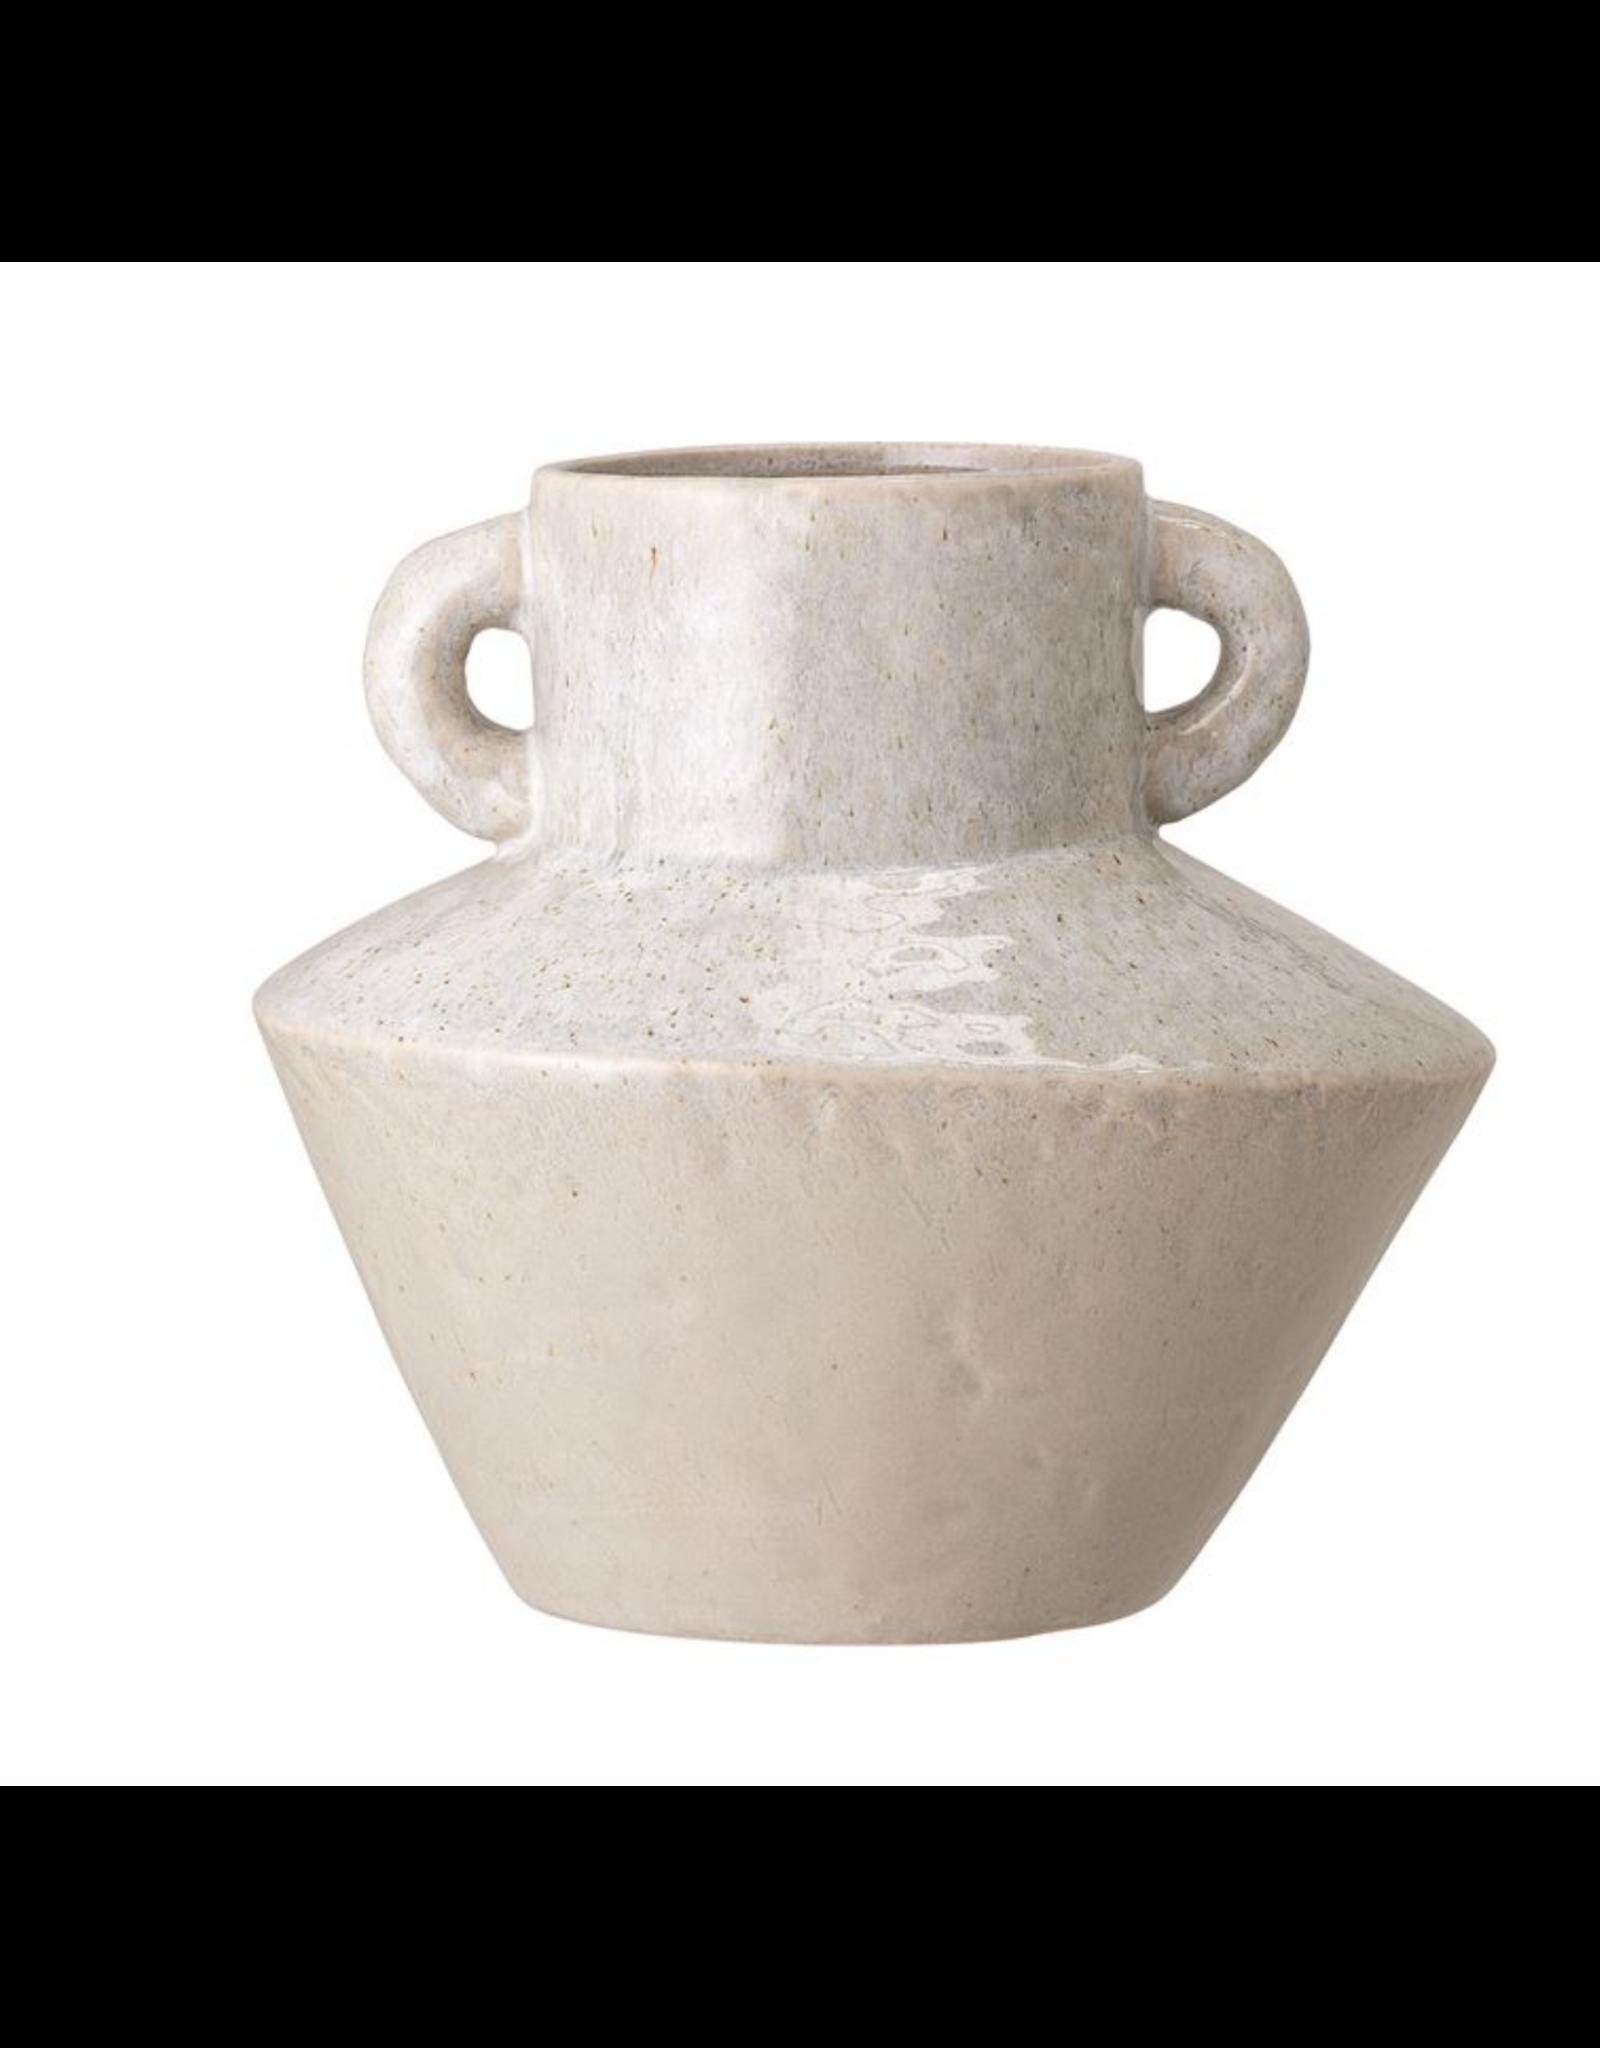 Stoneware Vase w/ Handles, Reactive Glaze, White